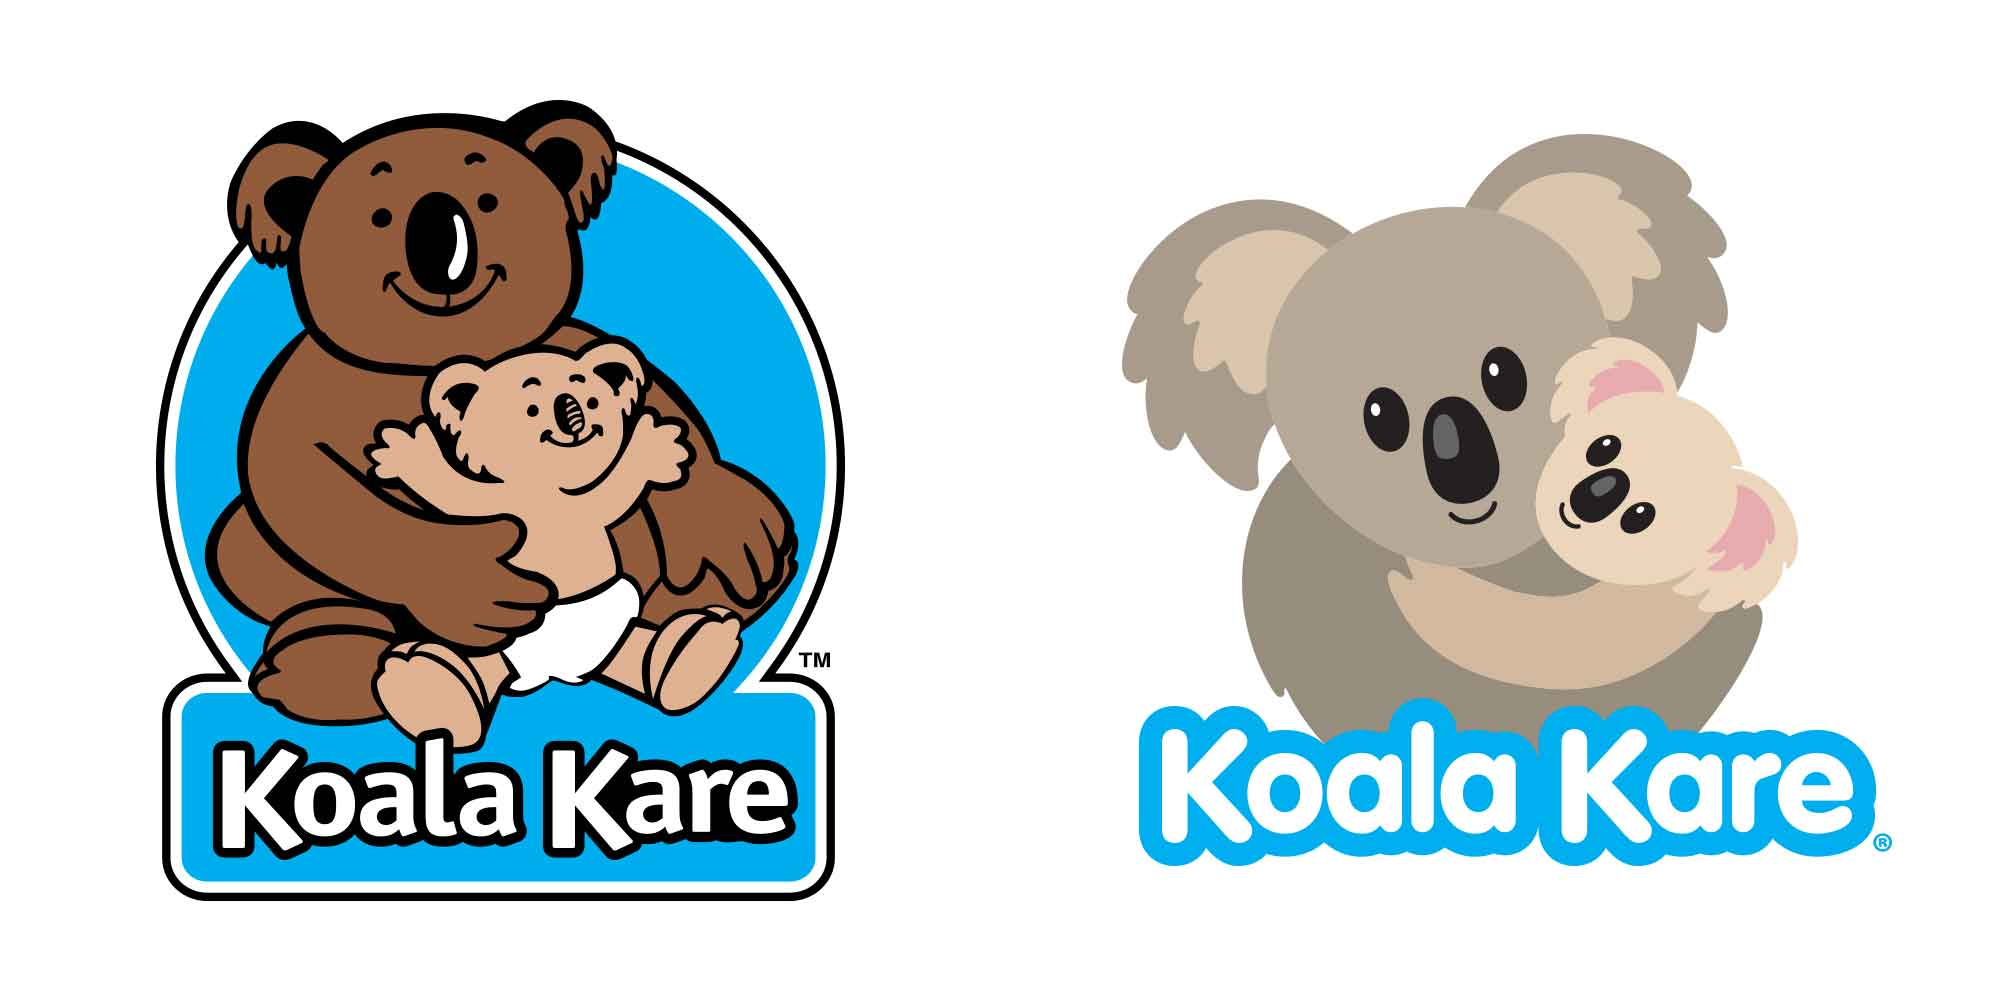 Koala Kare logo before and after